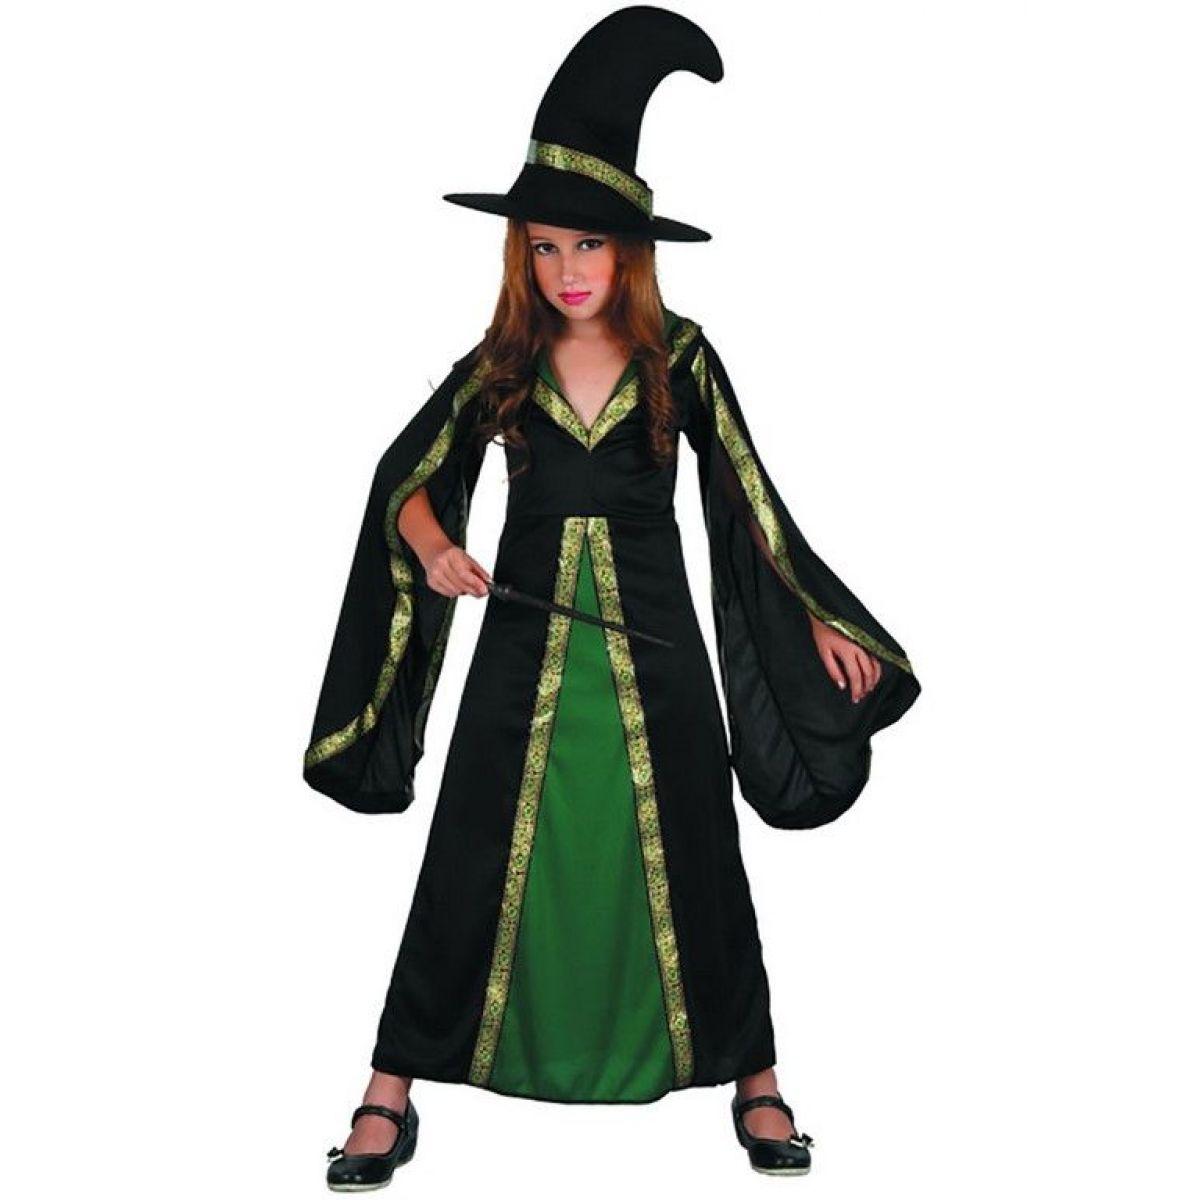 Dětské šaty na karneval čarodějka 120-130 cm